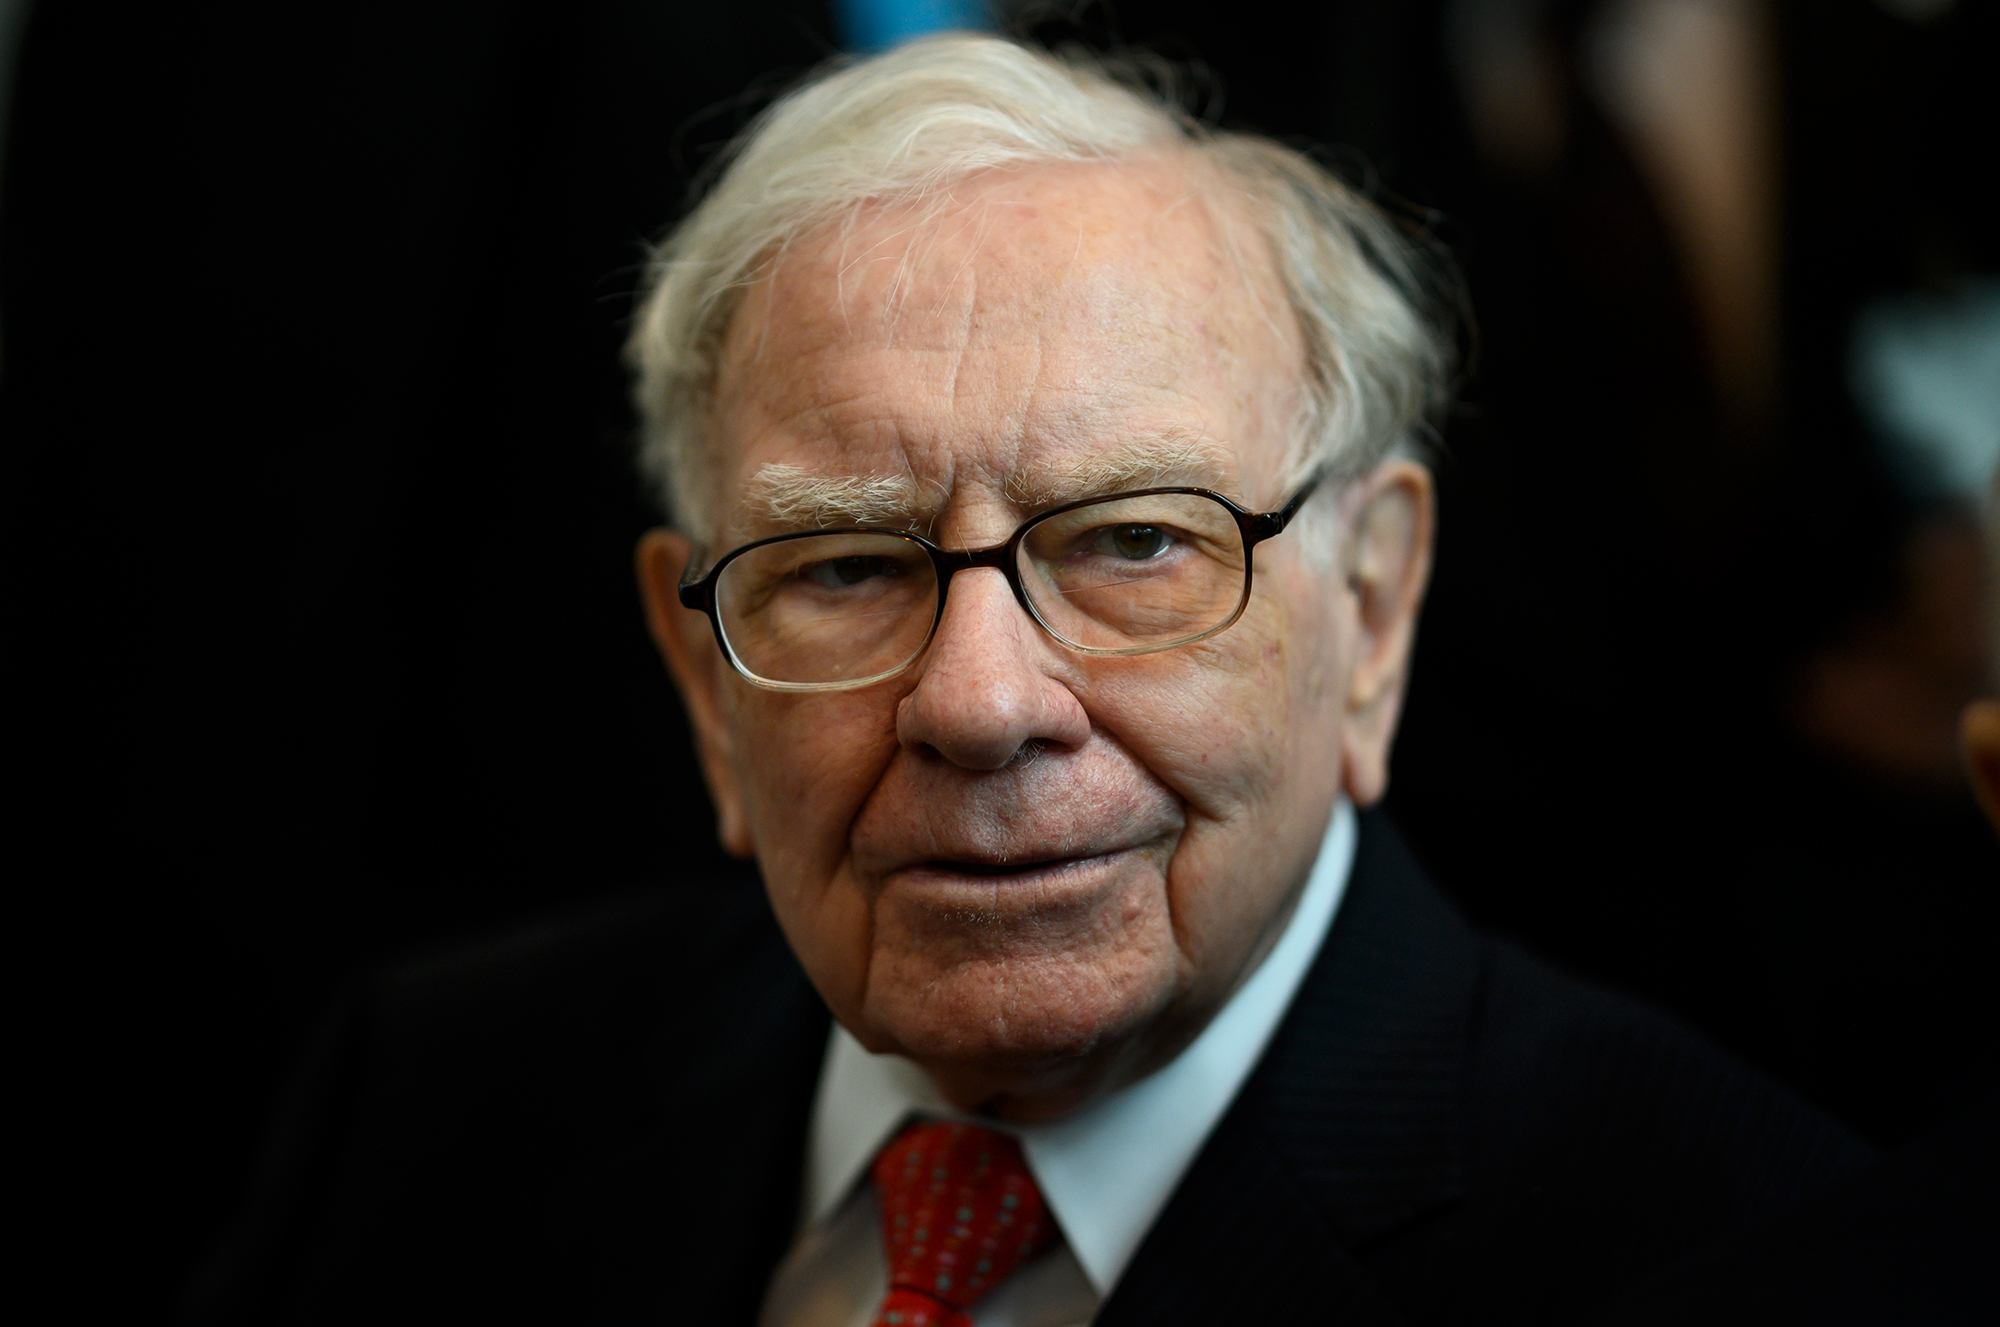 Warren Buffett hasn't publicly backed Biden despite past Democratic endorsements